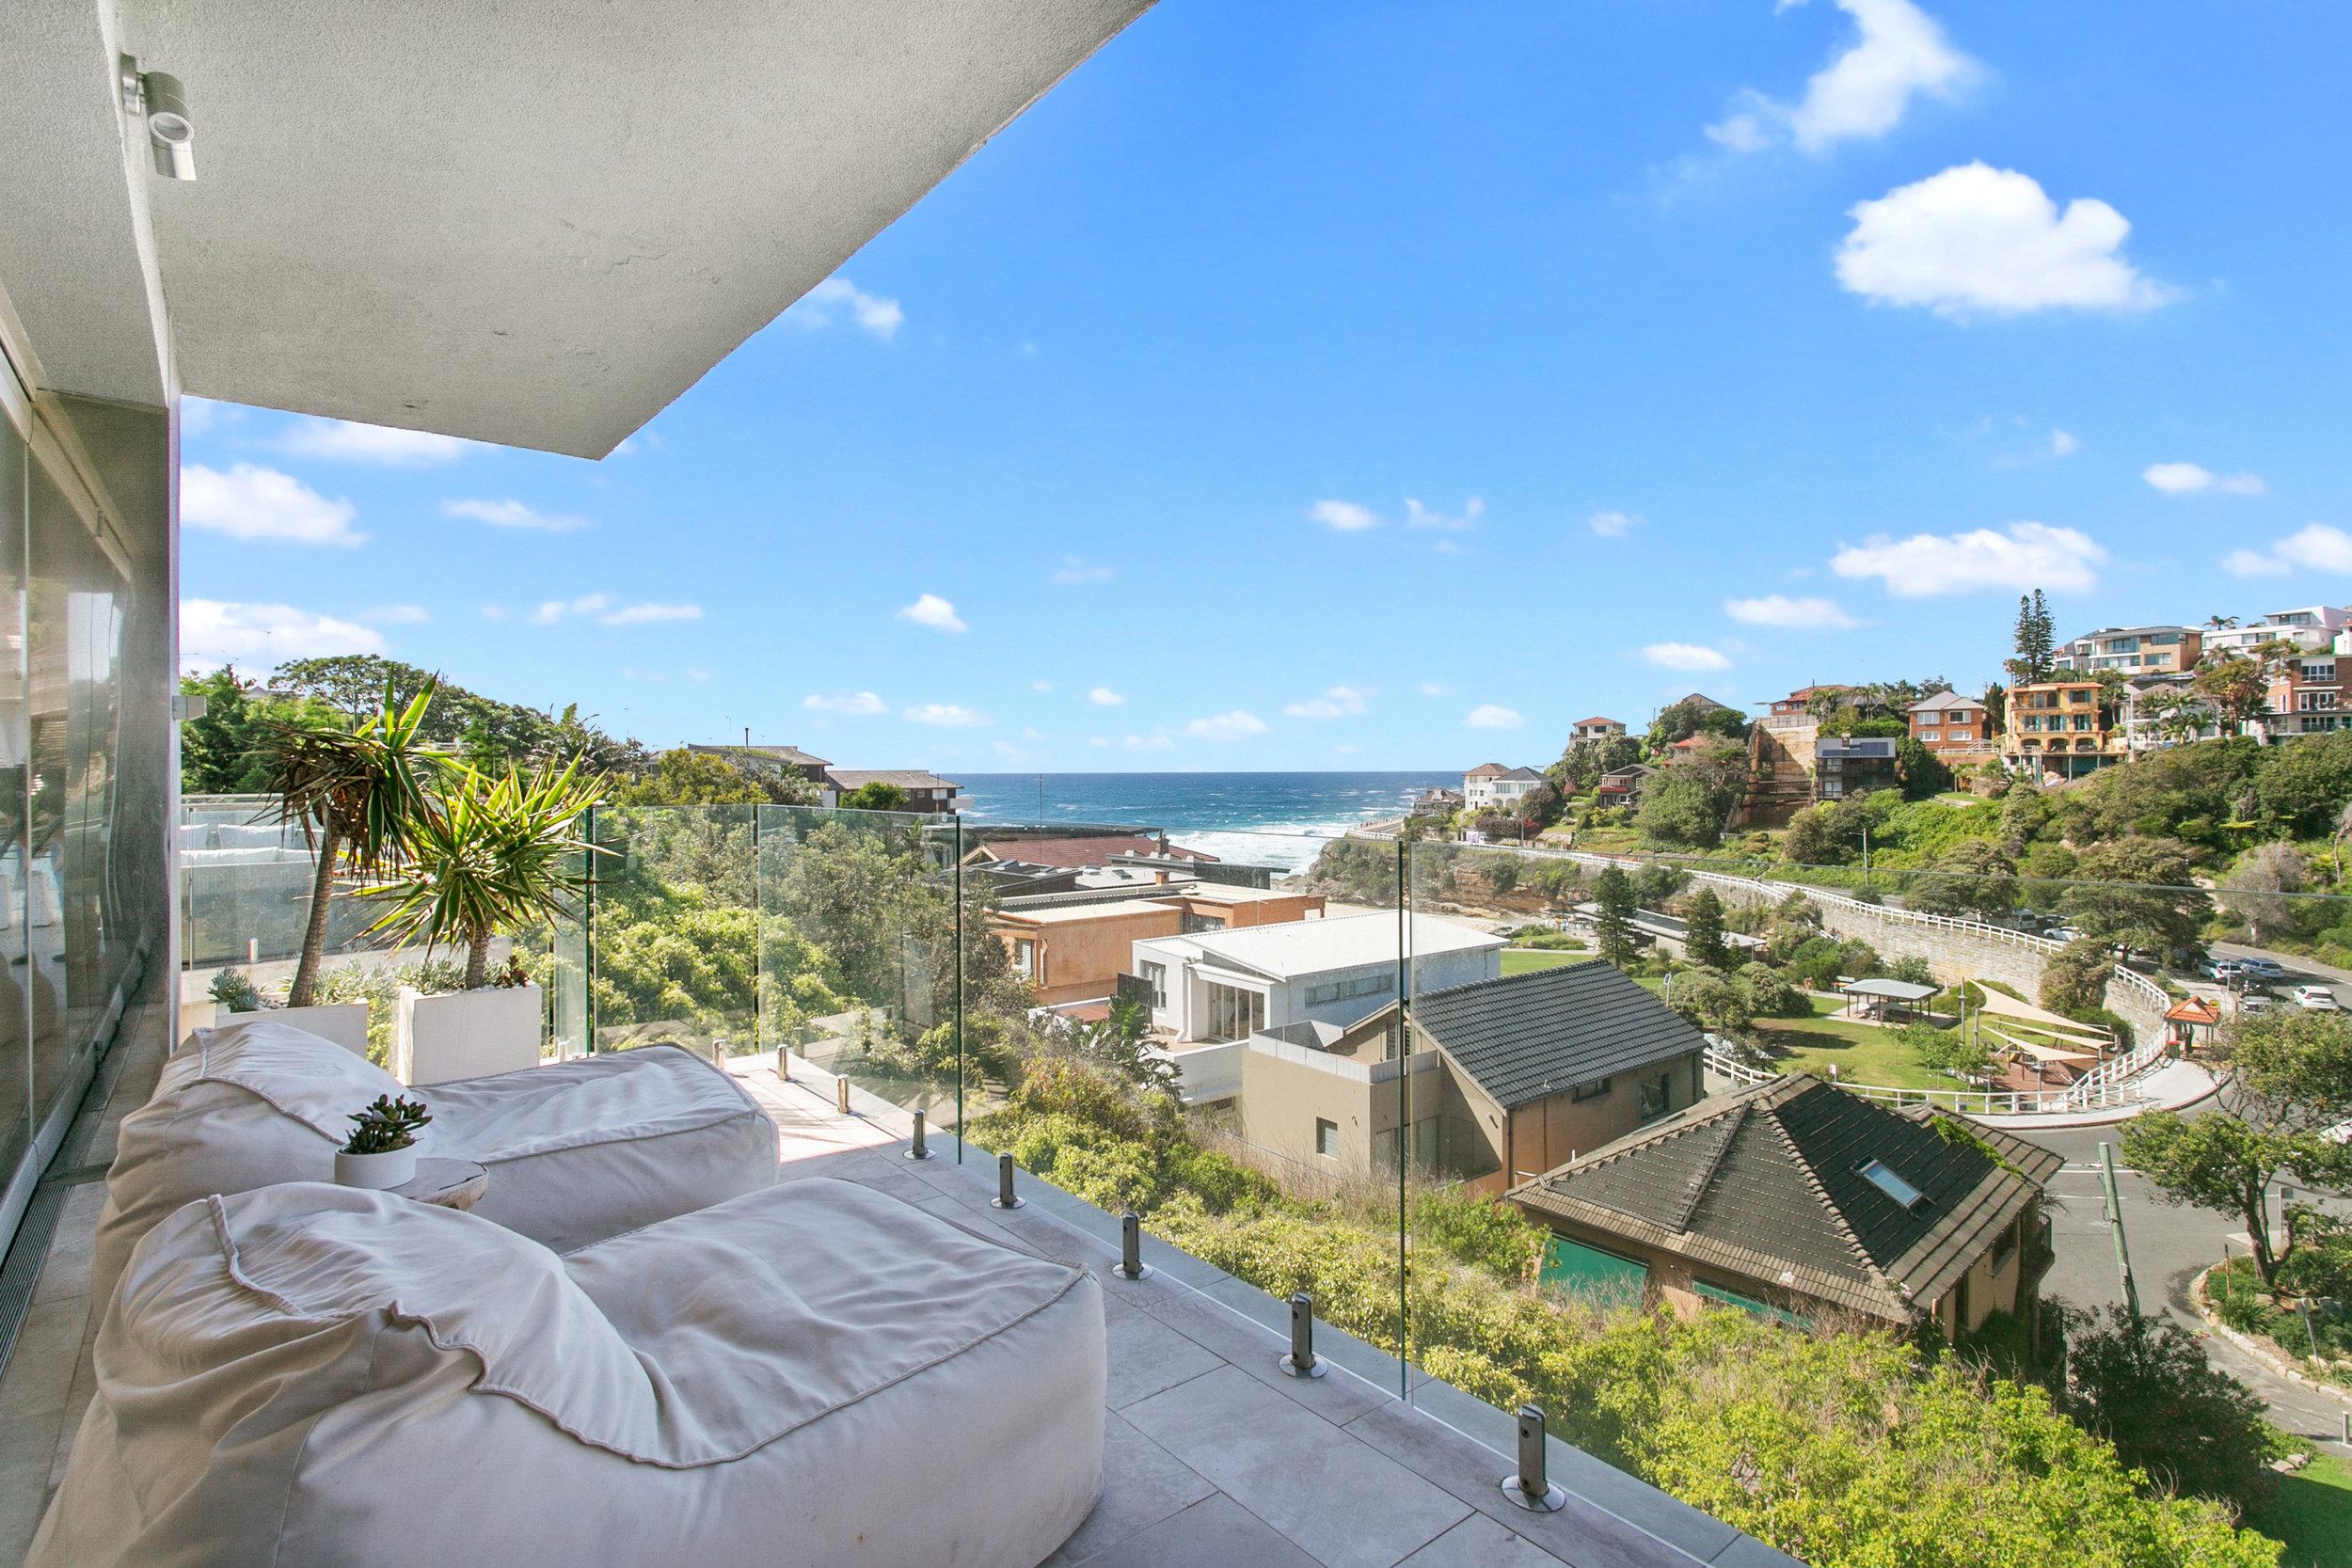 The Penthouse Tamarama ocean view. Bondi Beach Holiday Homes4.jpg